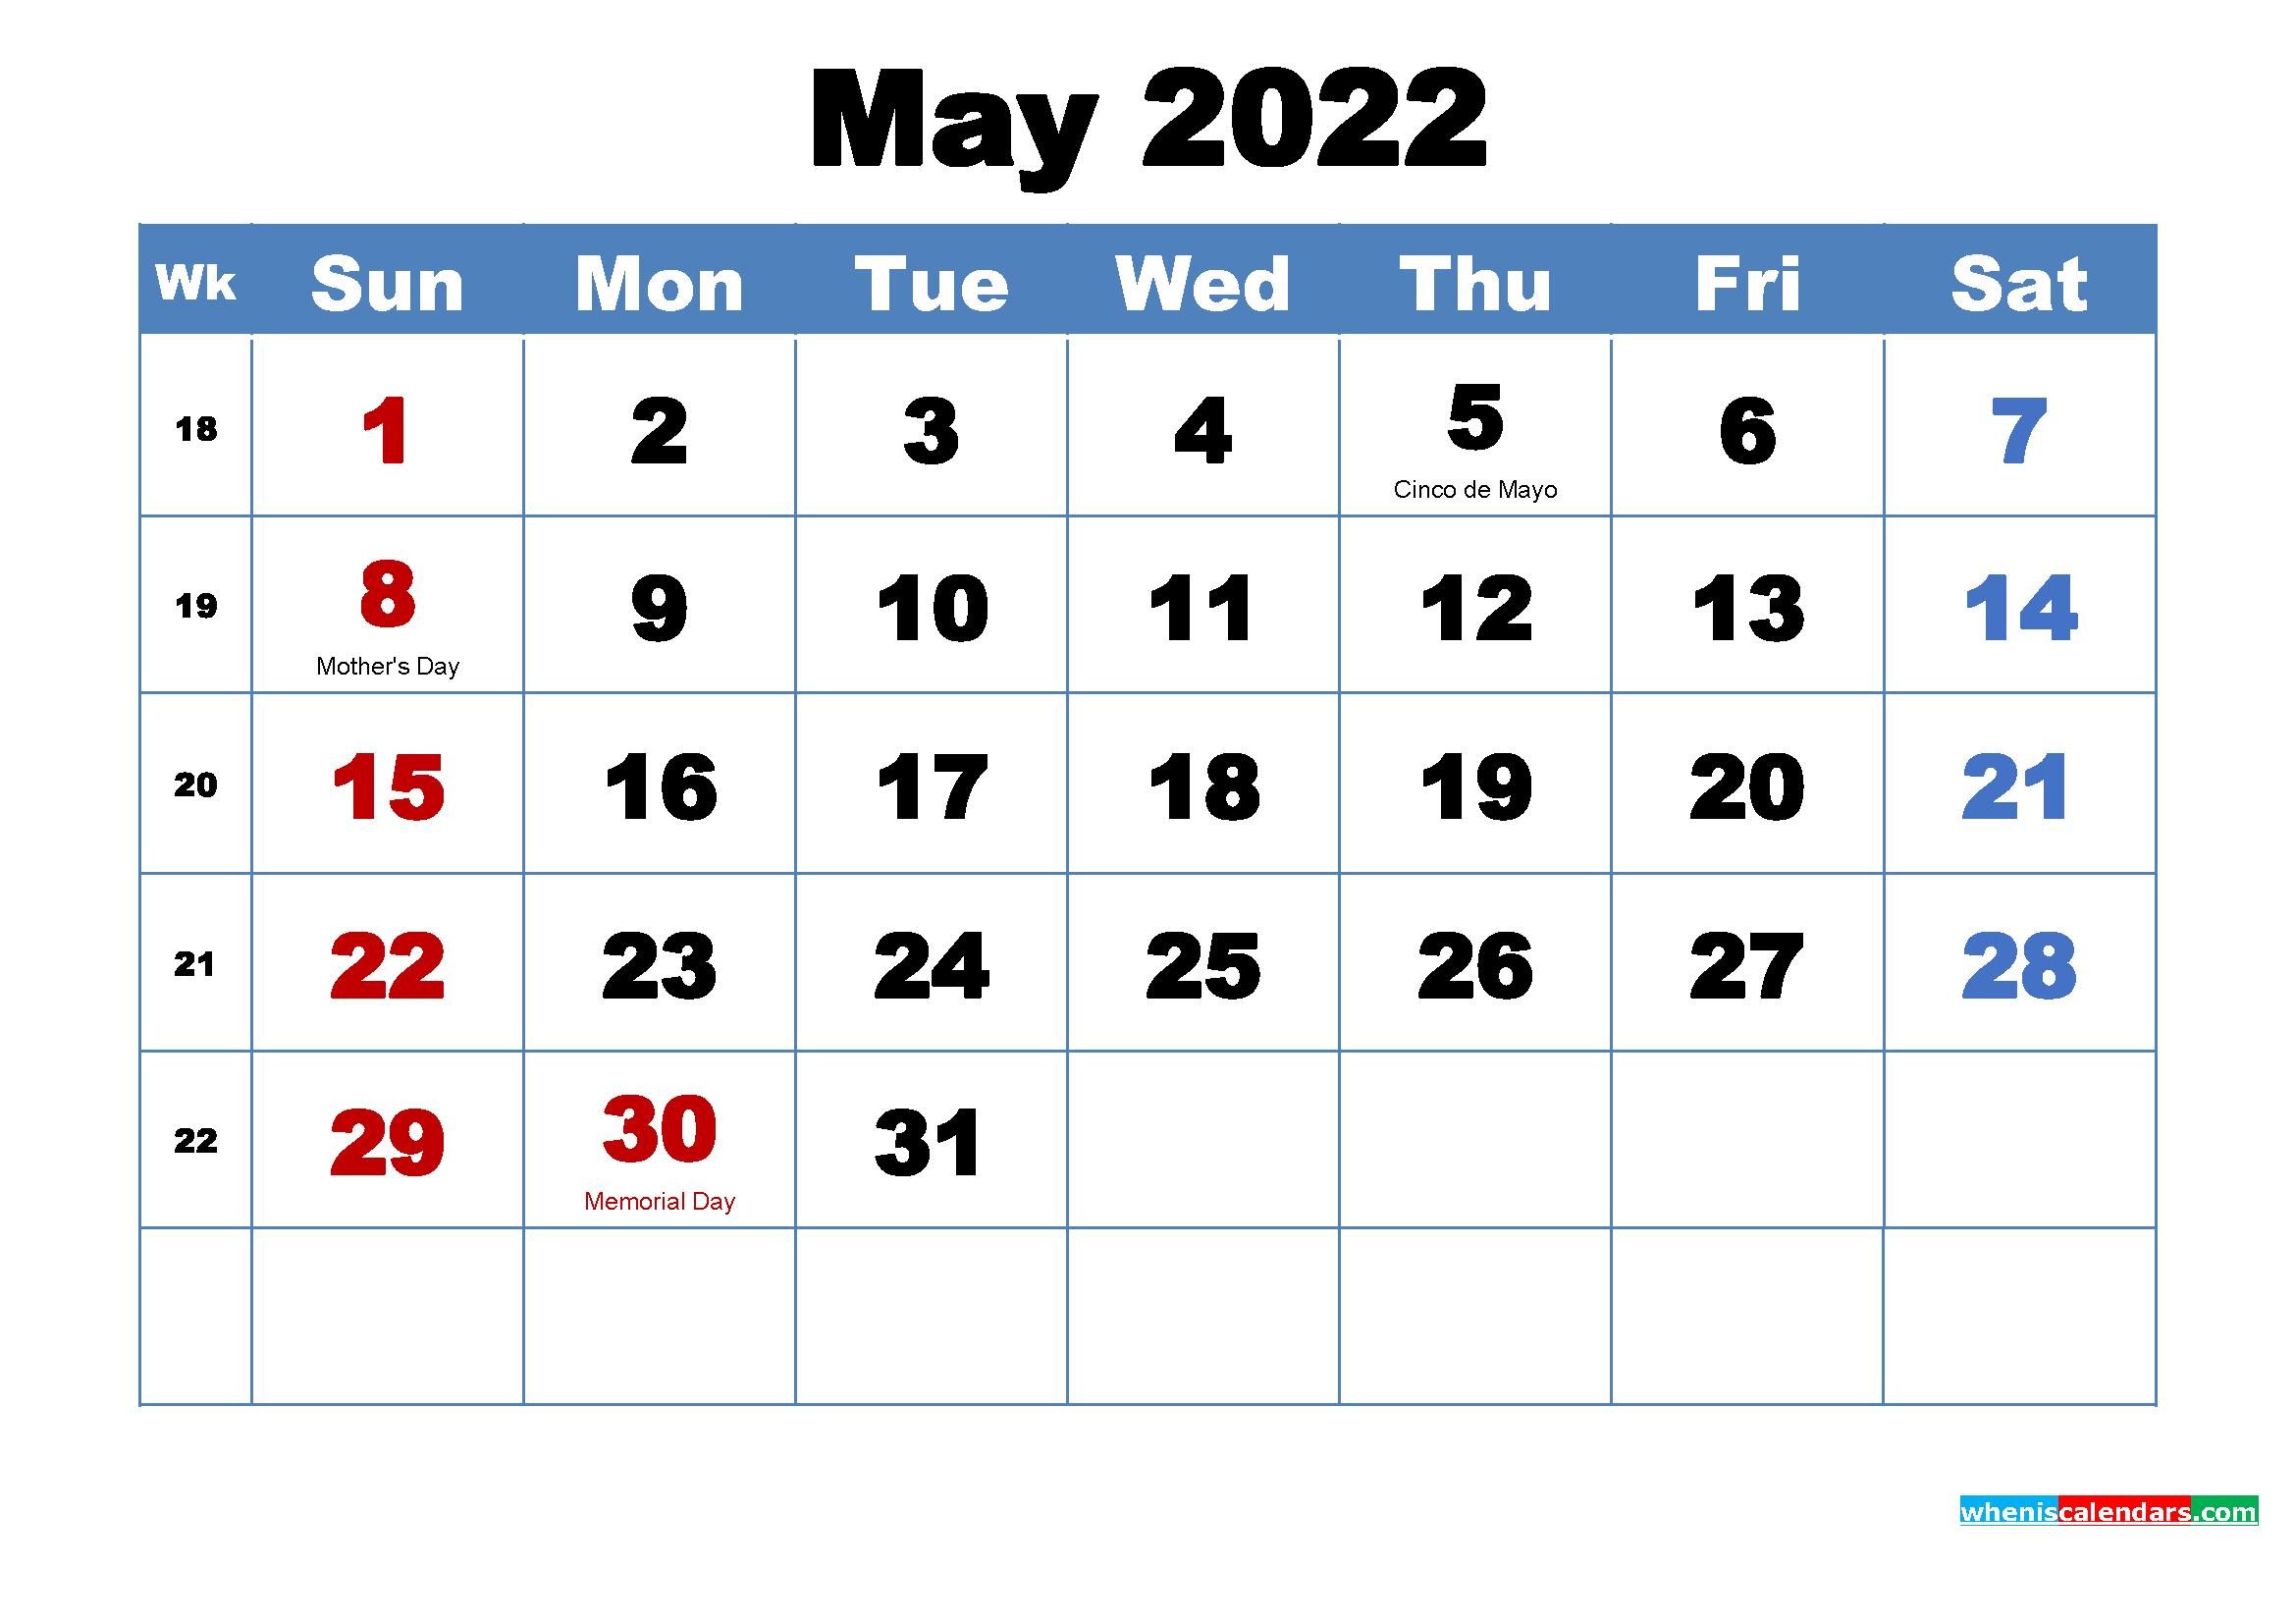 May 2022 Calendar Wallpaper Download 2339x1654